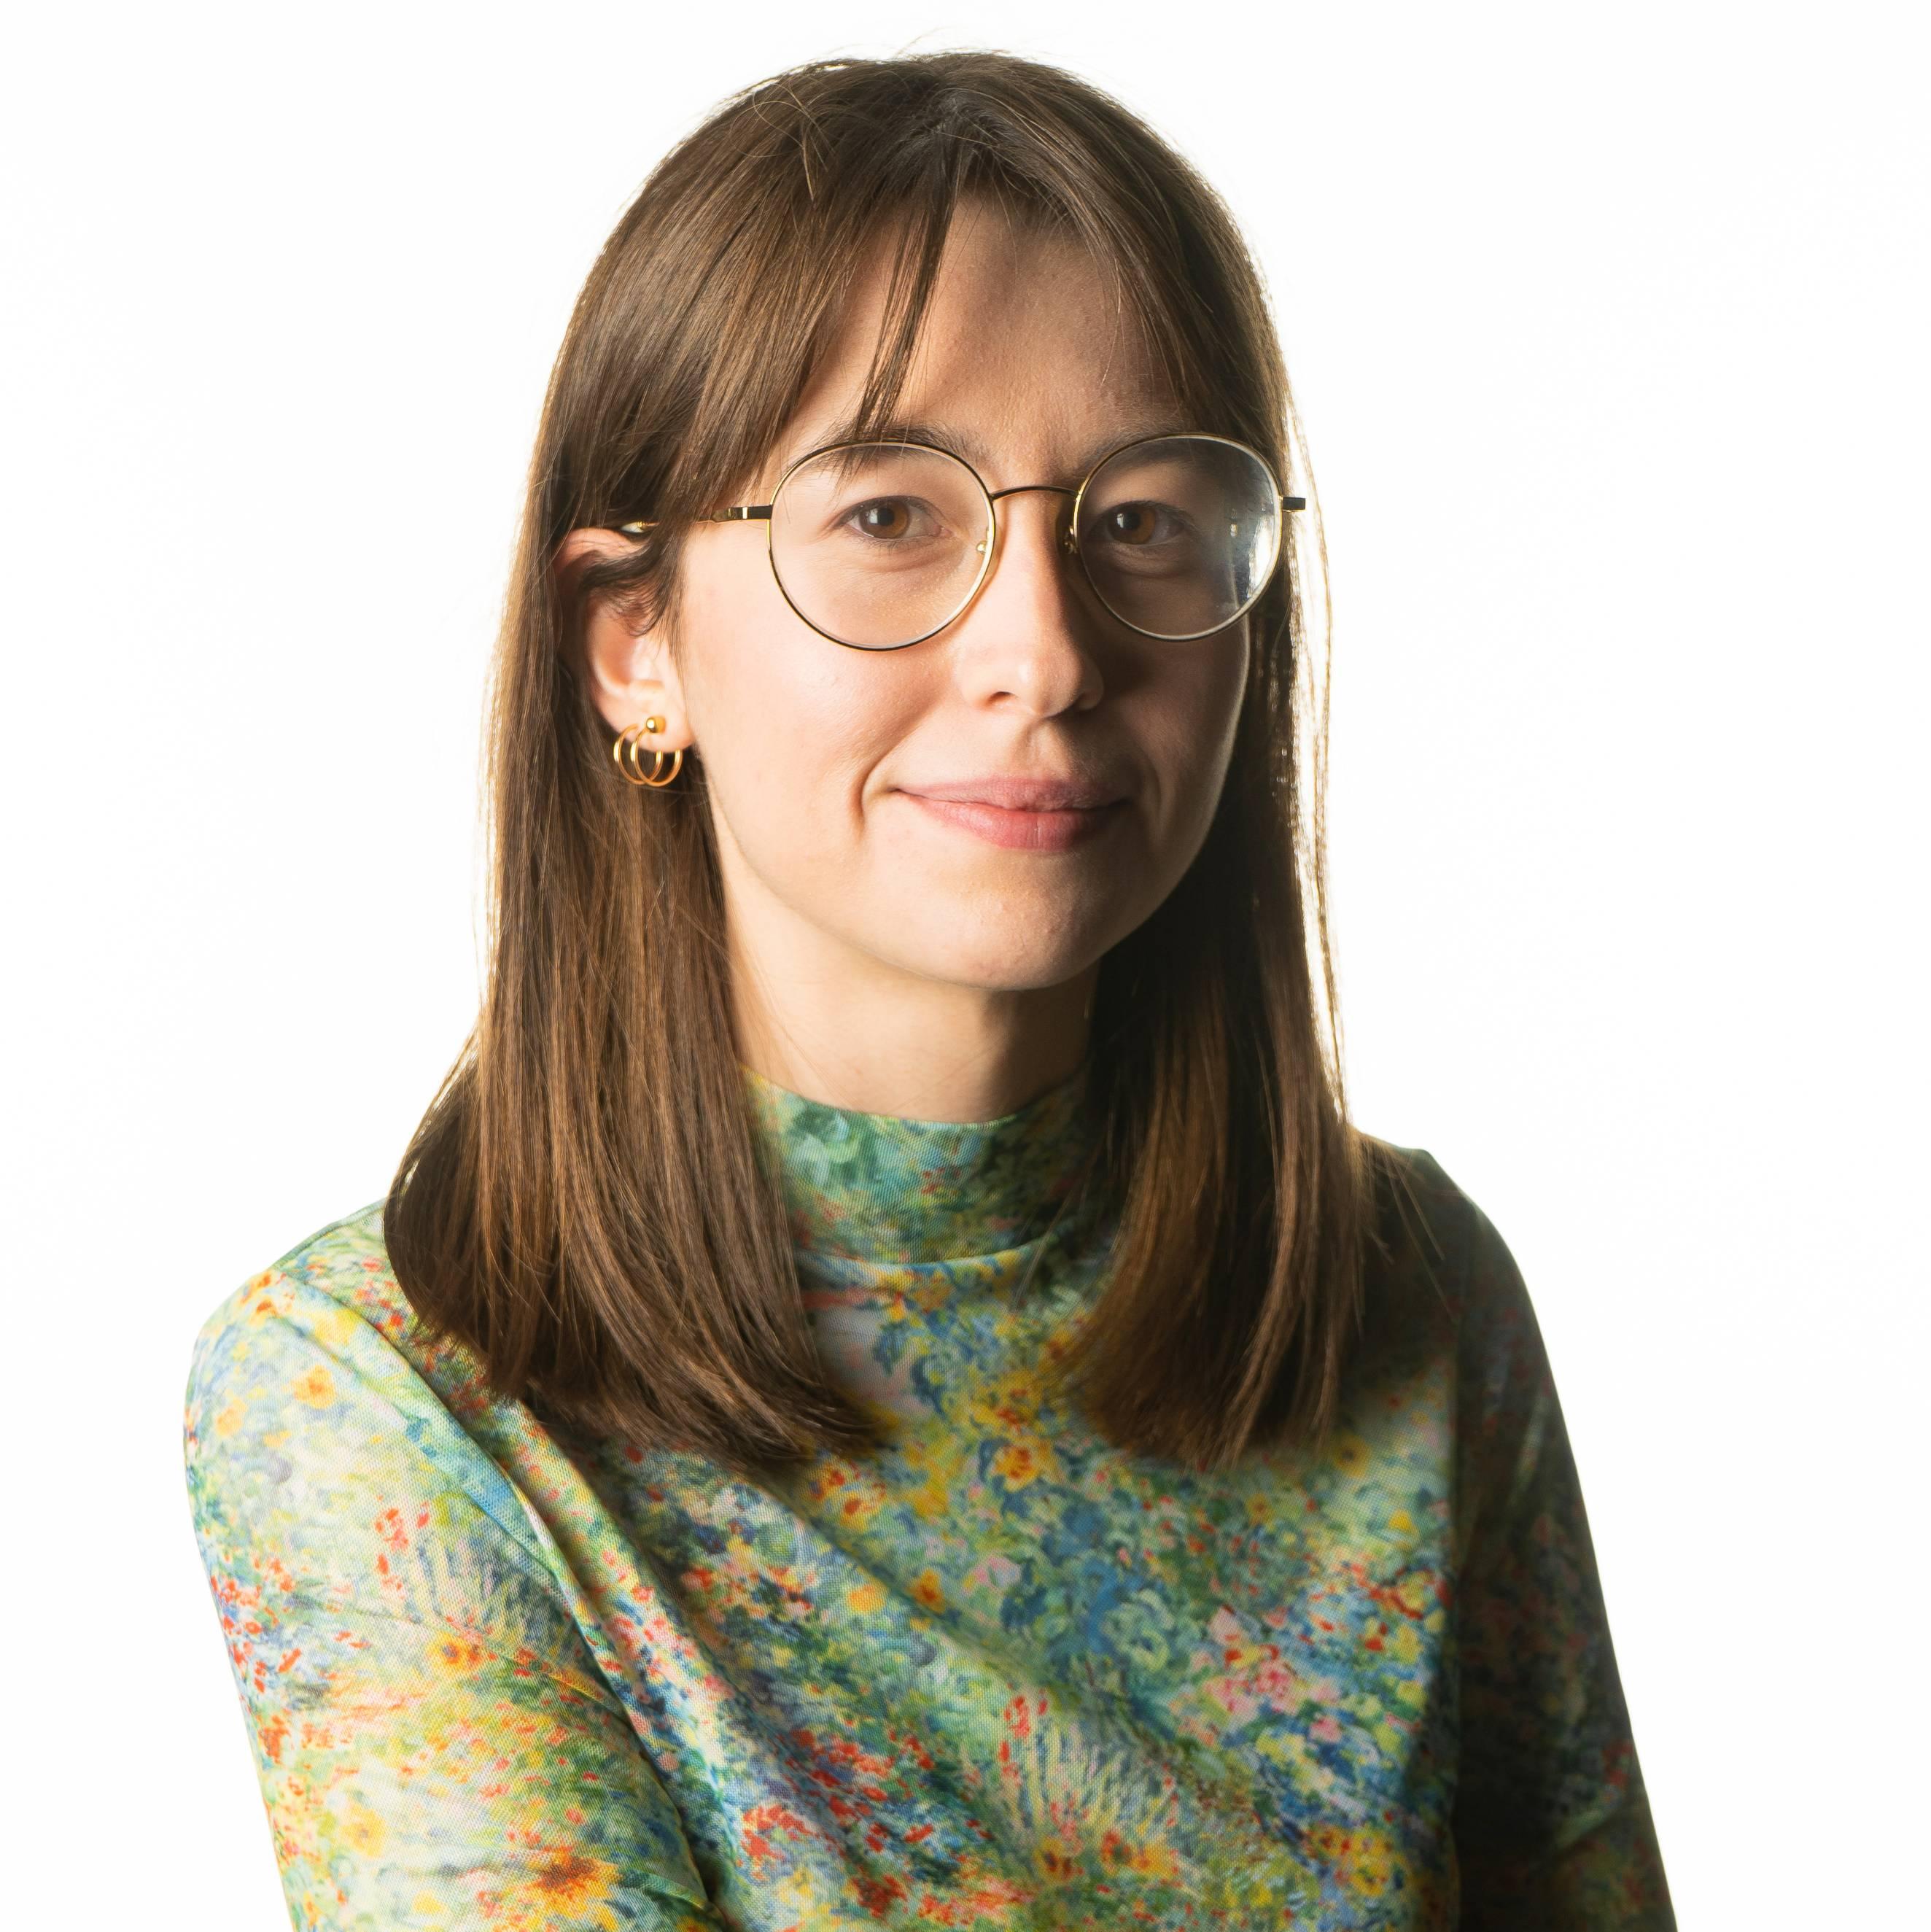 Photo of FMTV Graduate Olivia Wozny